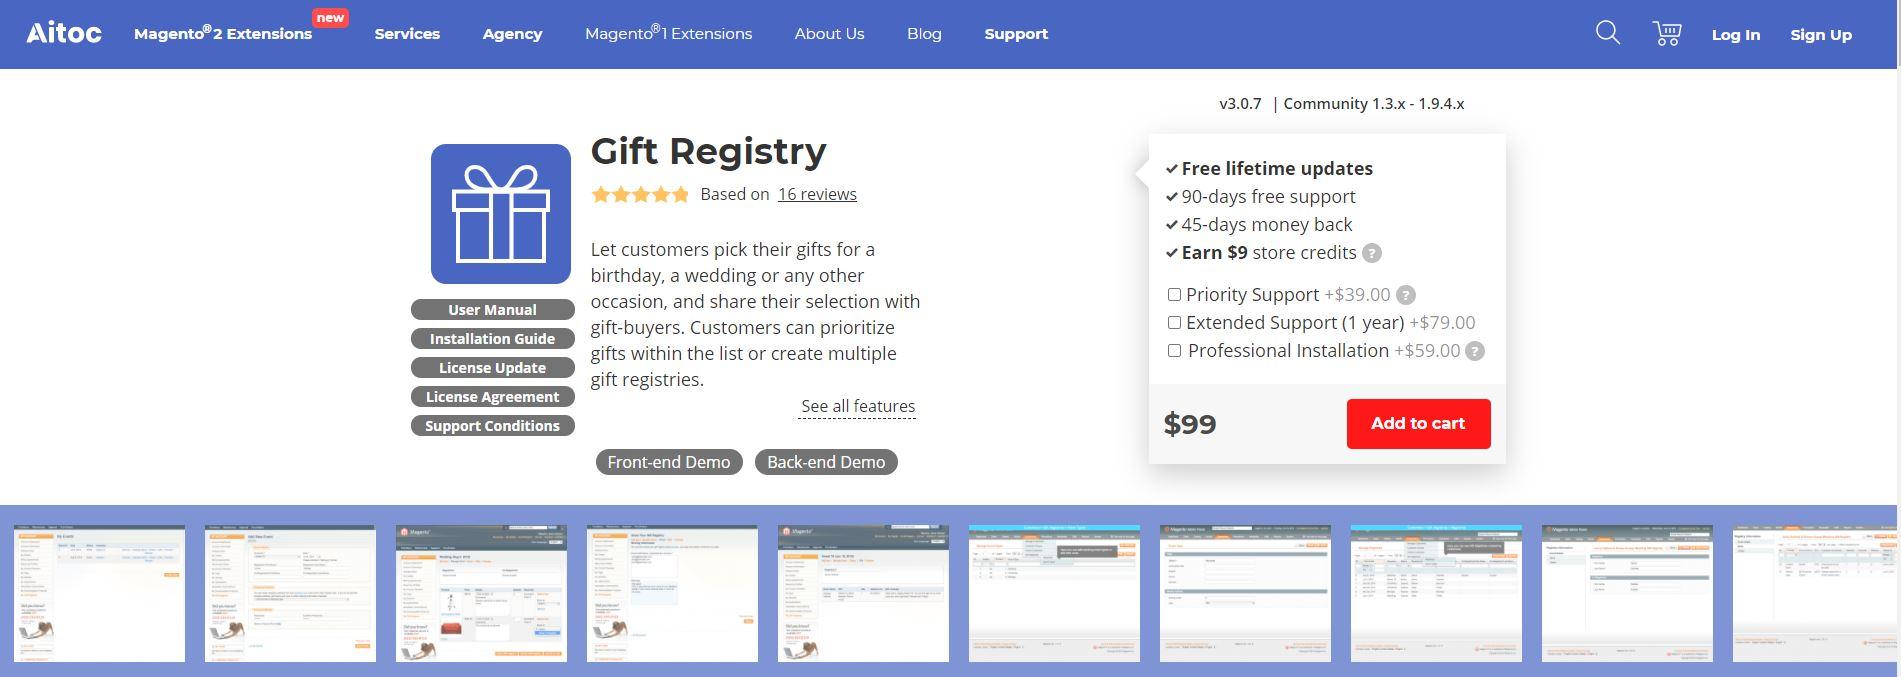 Magento gift registry extension